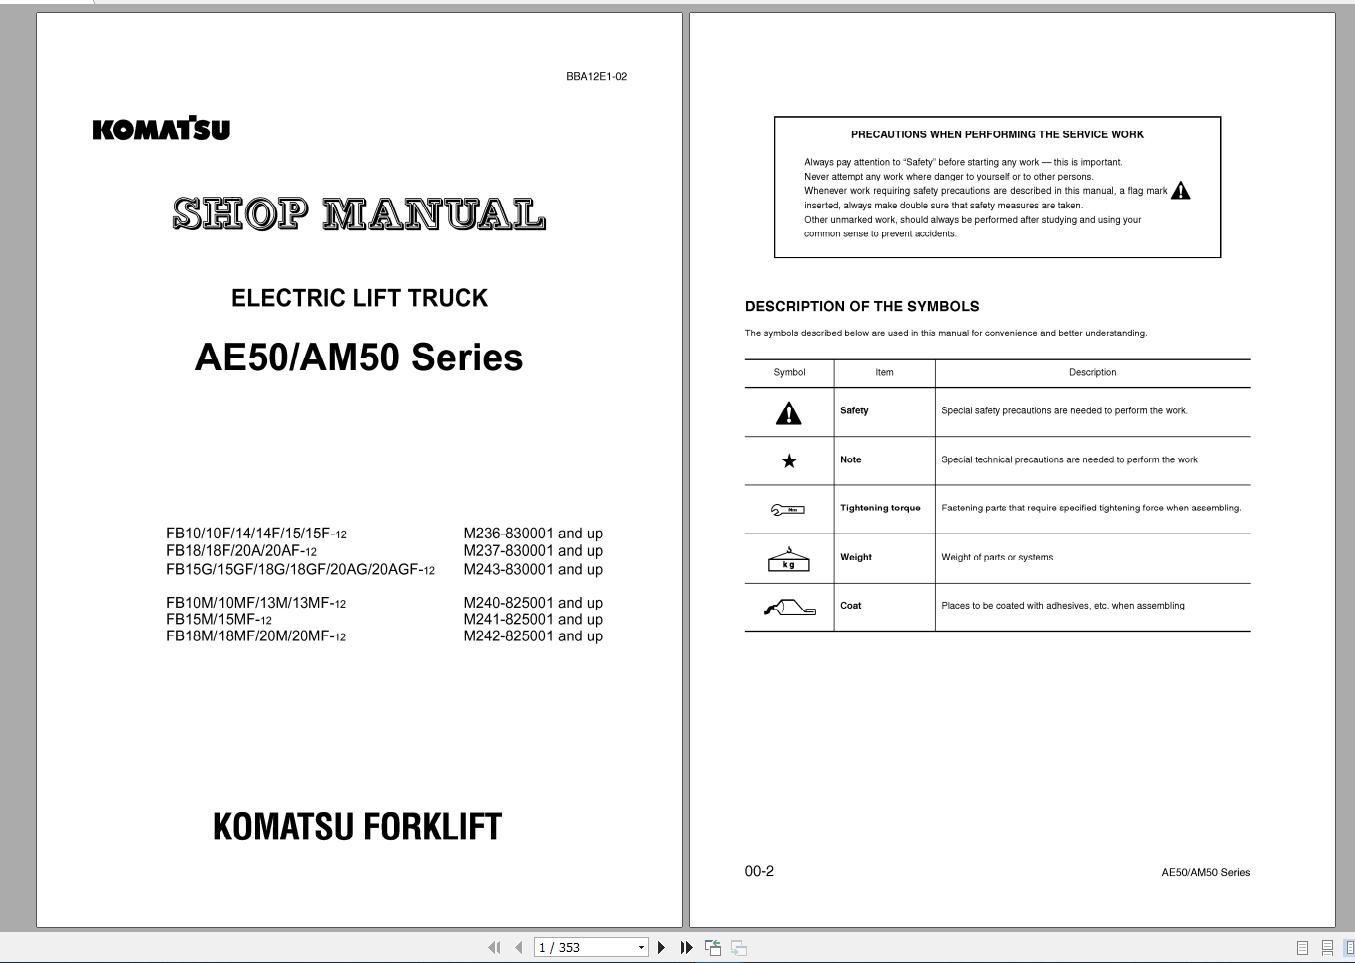 Komatsu_Forklift_Service_Manual_PDF_DVD4